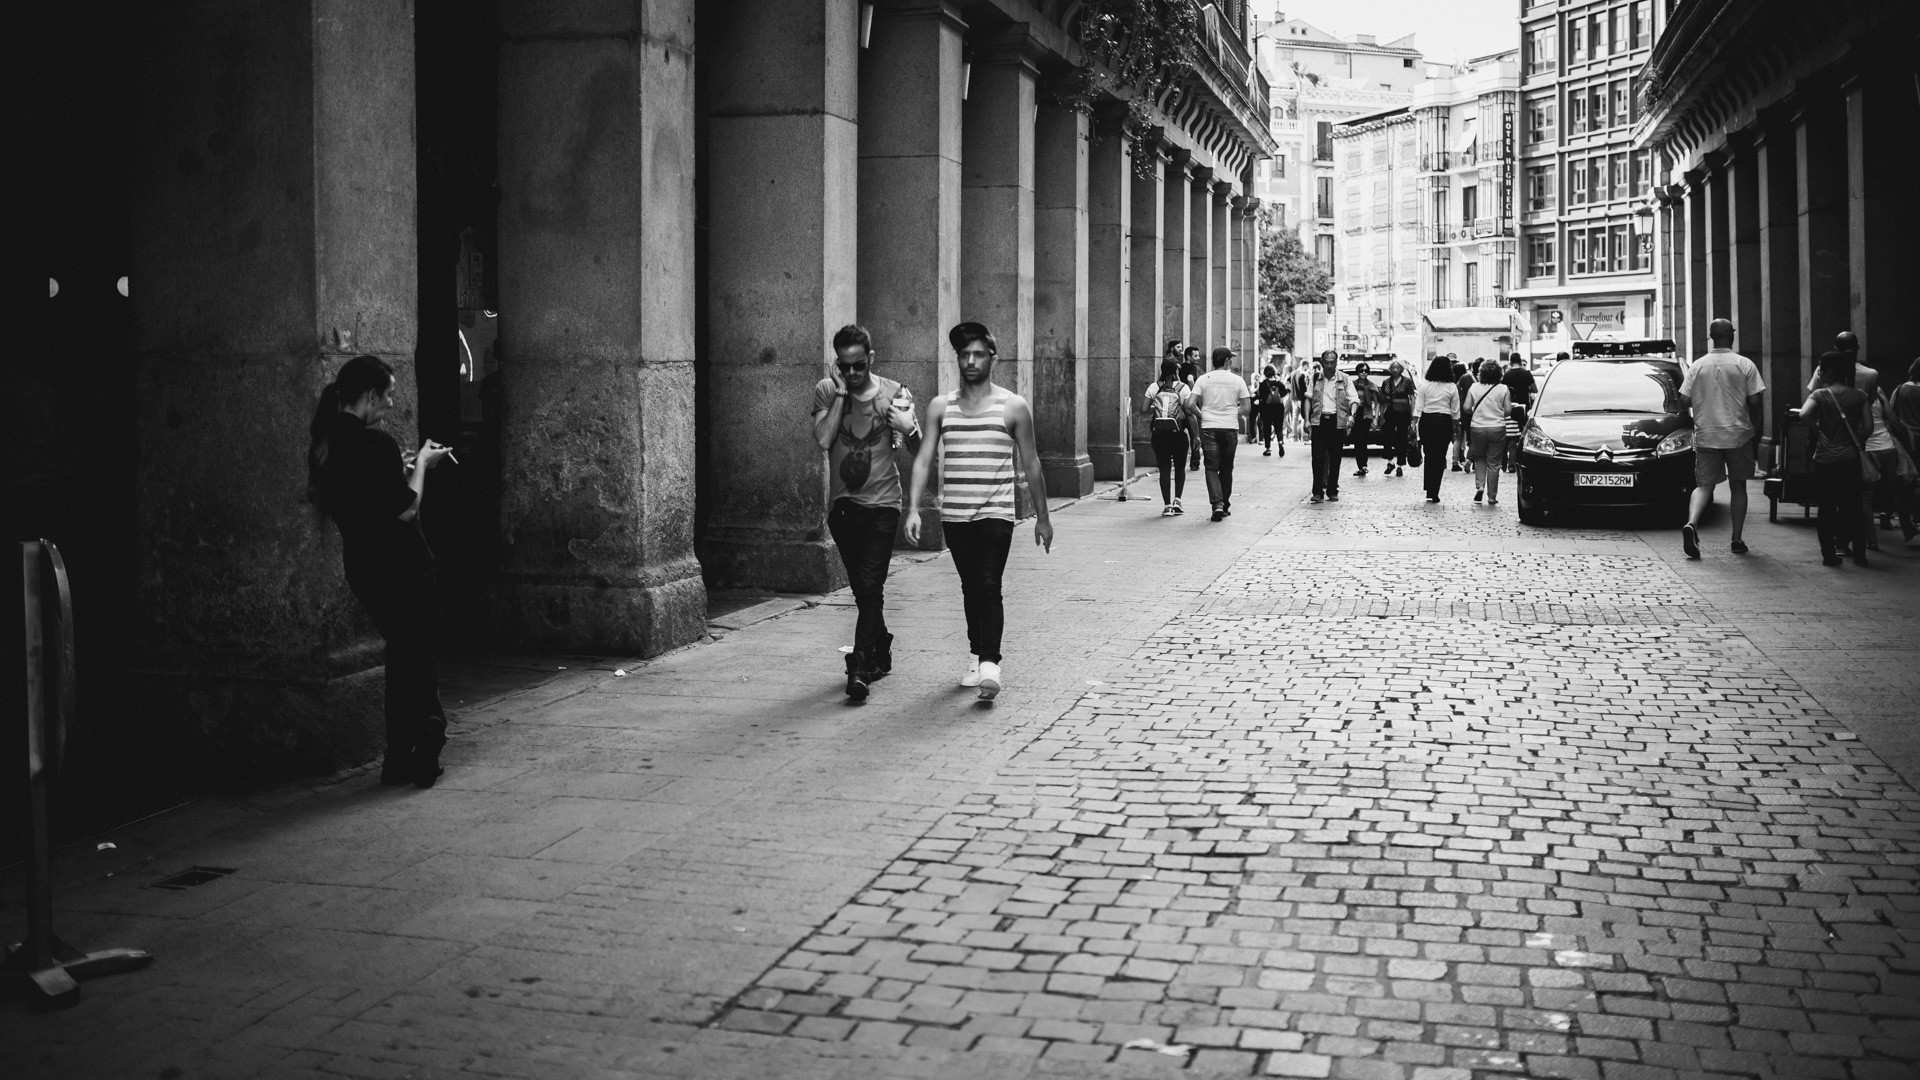 Damien-Dohmen-Photographe-Madrid-13